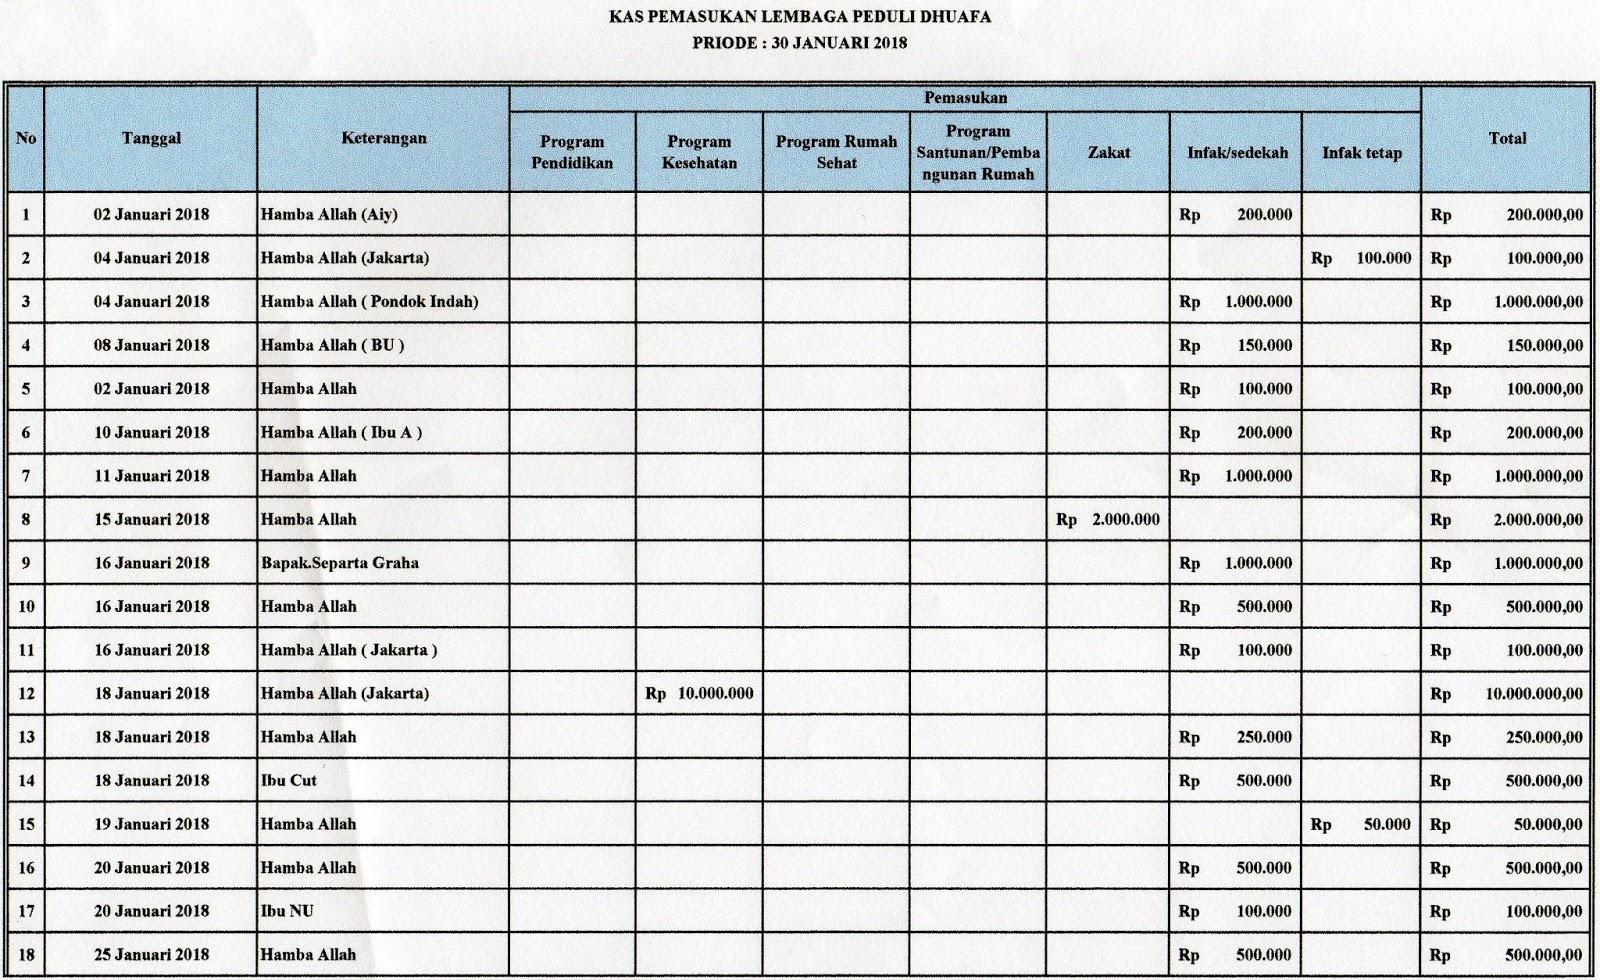 Laporan Keungan & Kegiatan Lembaga Peduli Dhuafa Bulan Januri 2018